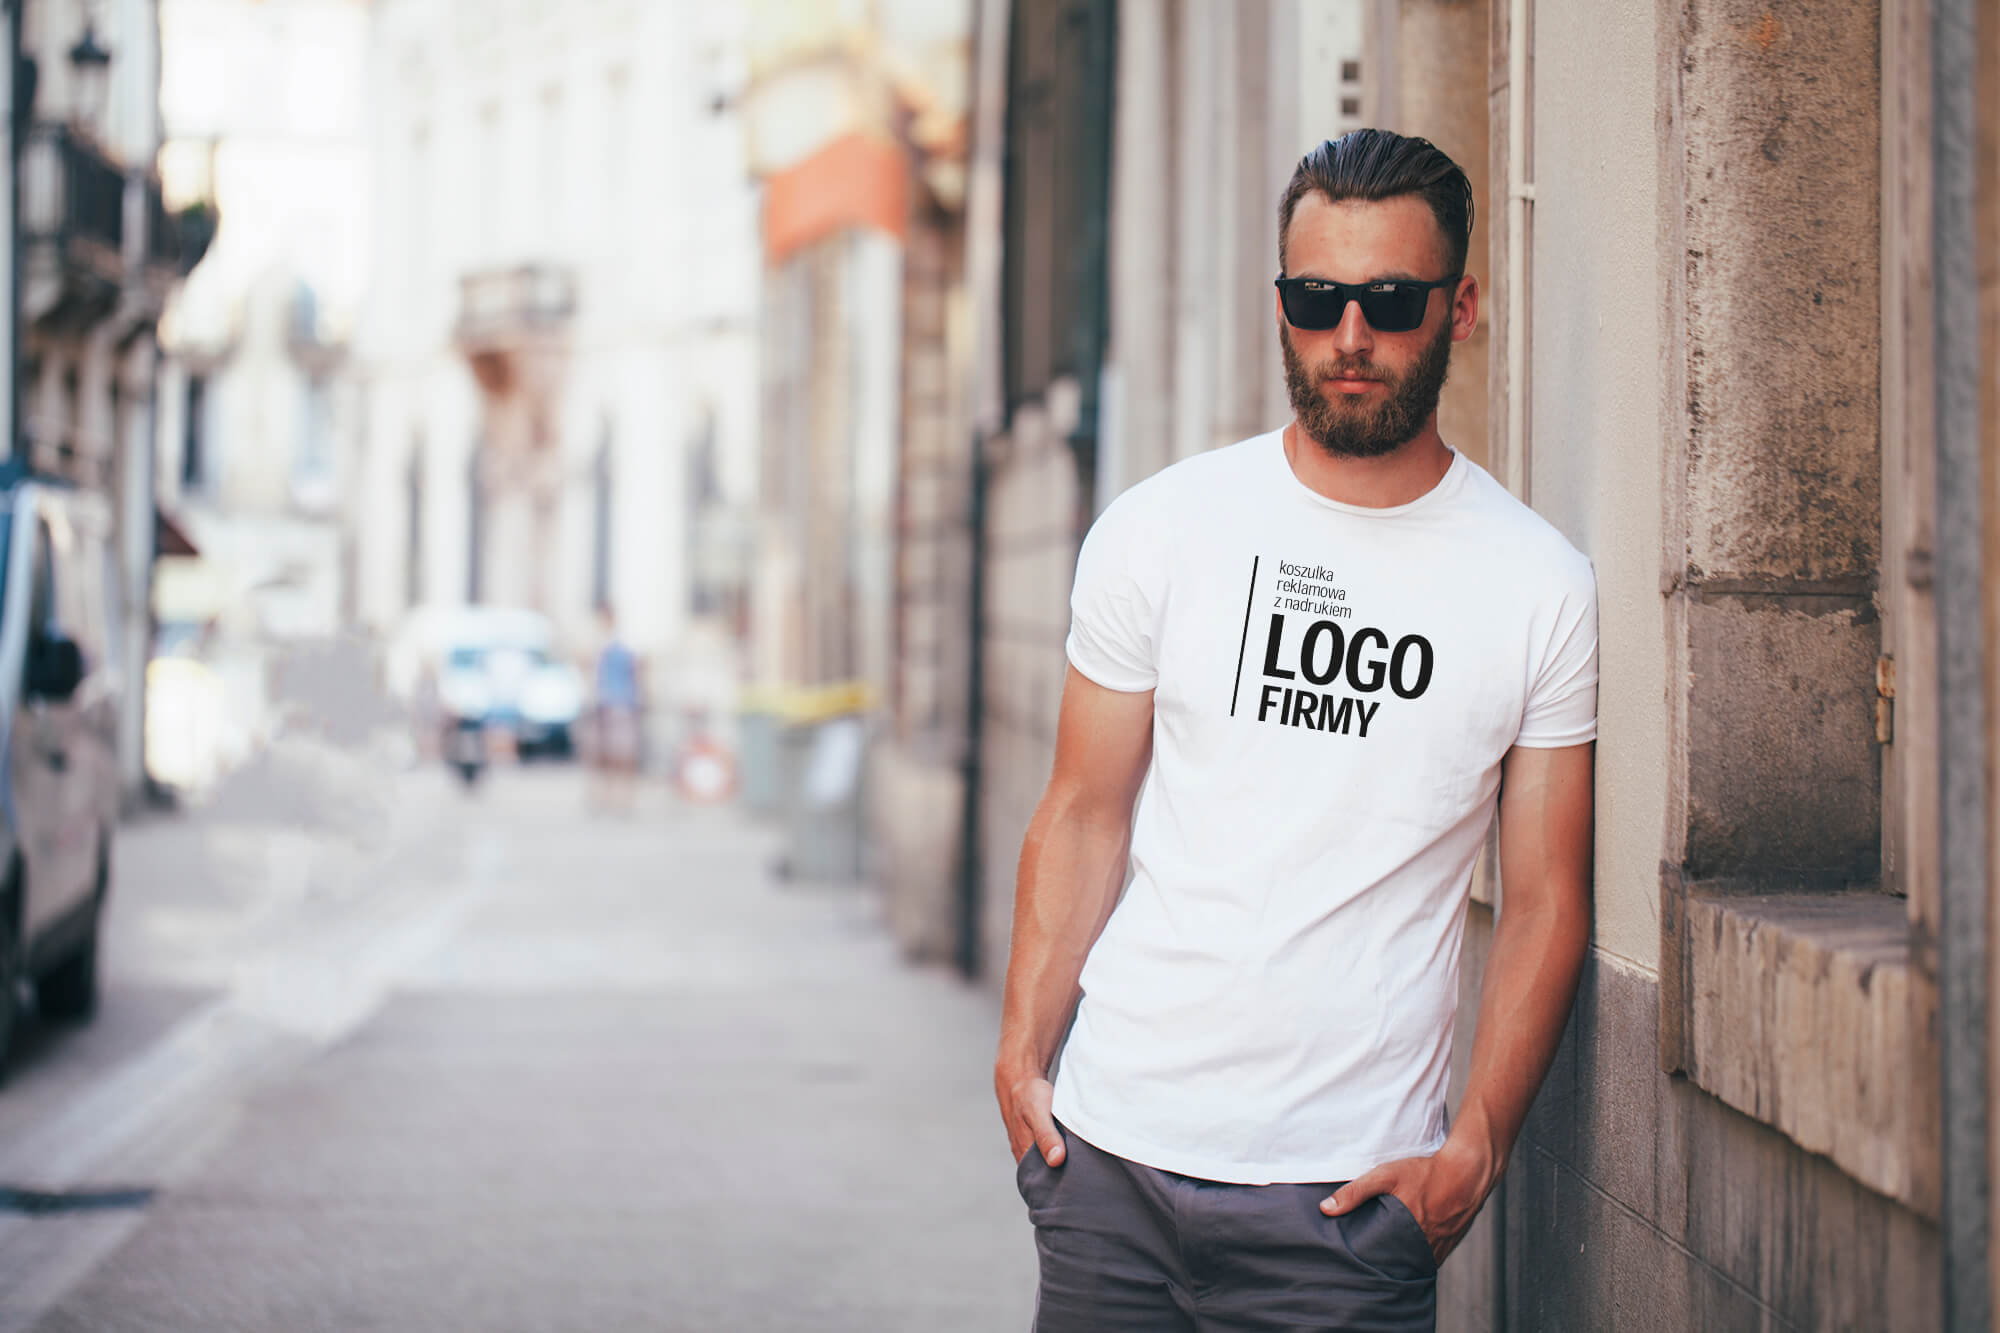 koszulka reklamowa, koszulki reklamowe, ubrania reklamowe, koszulka reklamowa z nadrukiem, koszulki firmowe z logo